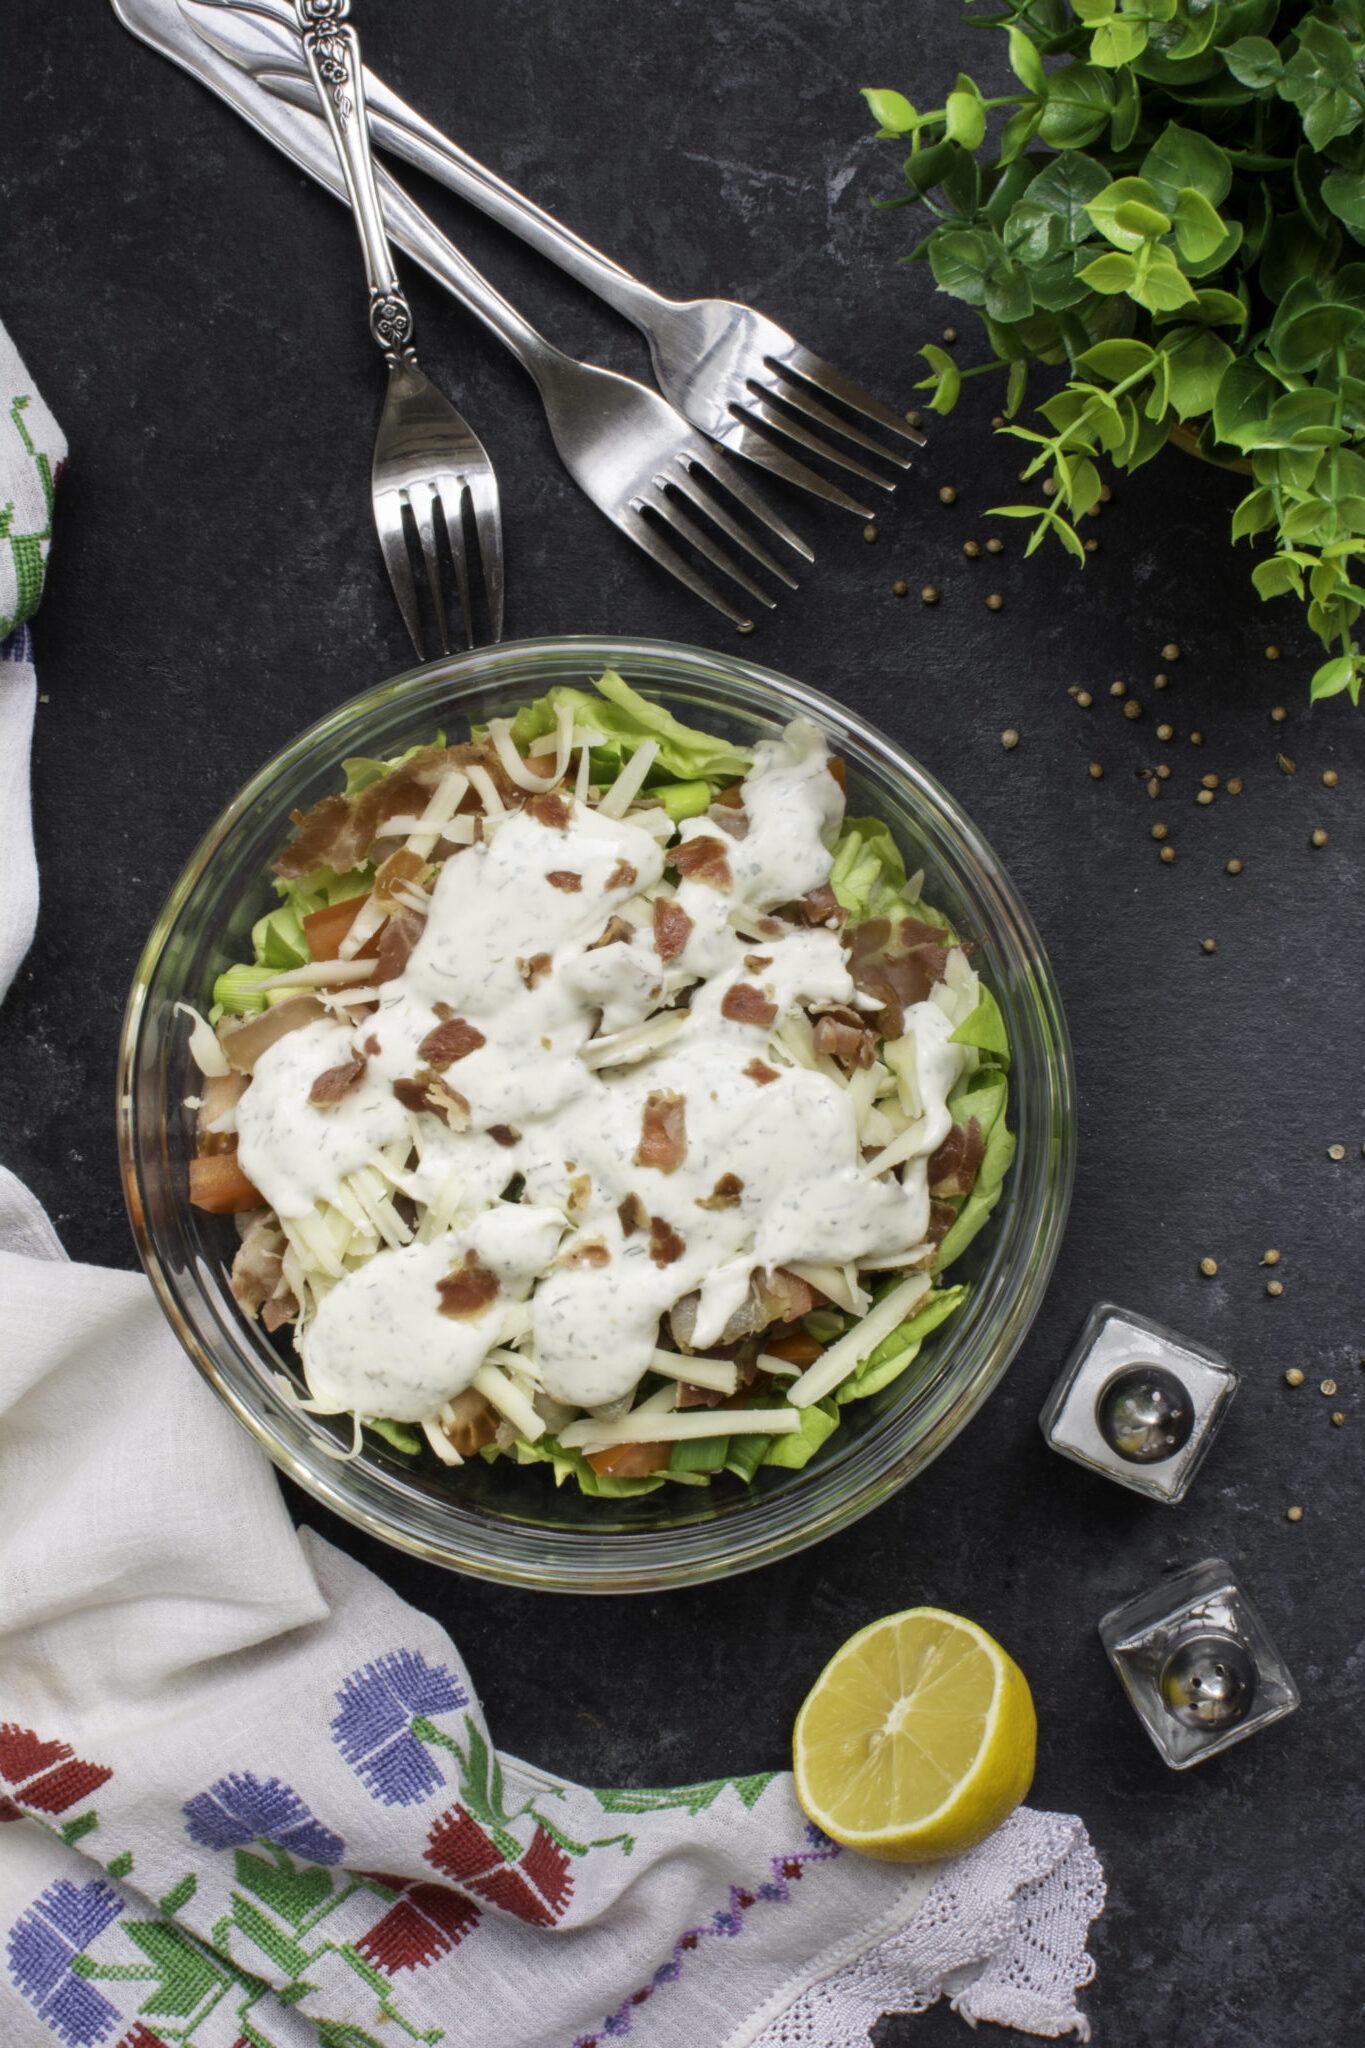 Keto Salad Recipe - BLT Bacon Lettuce Tomato